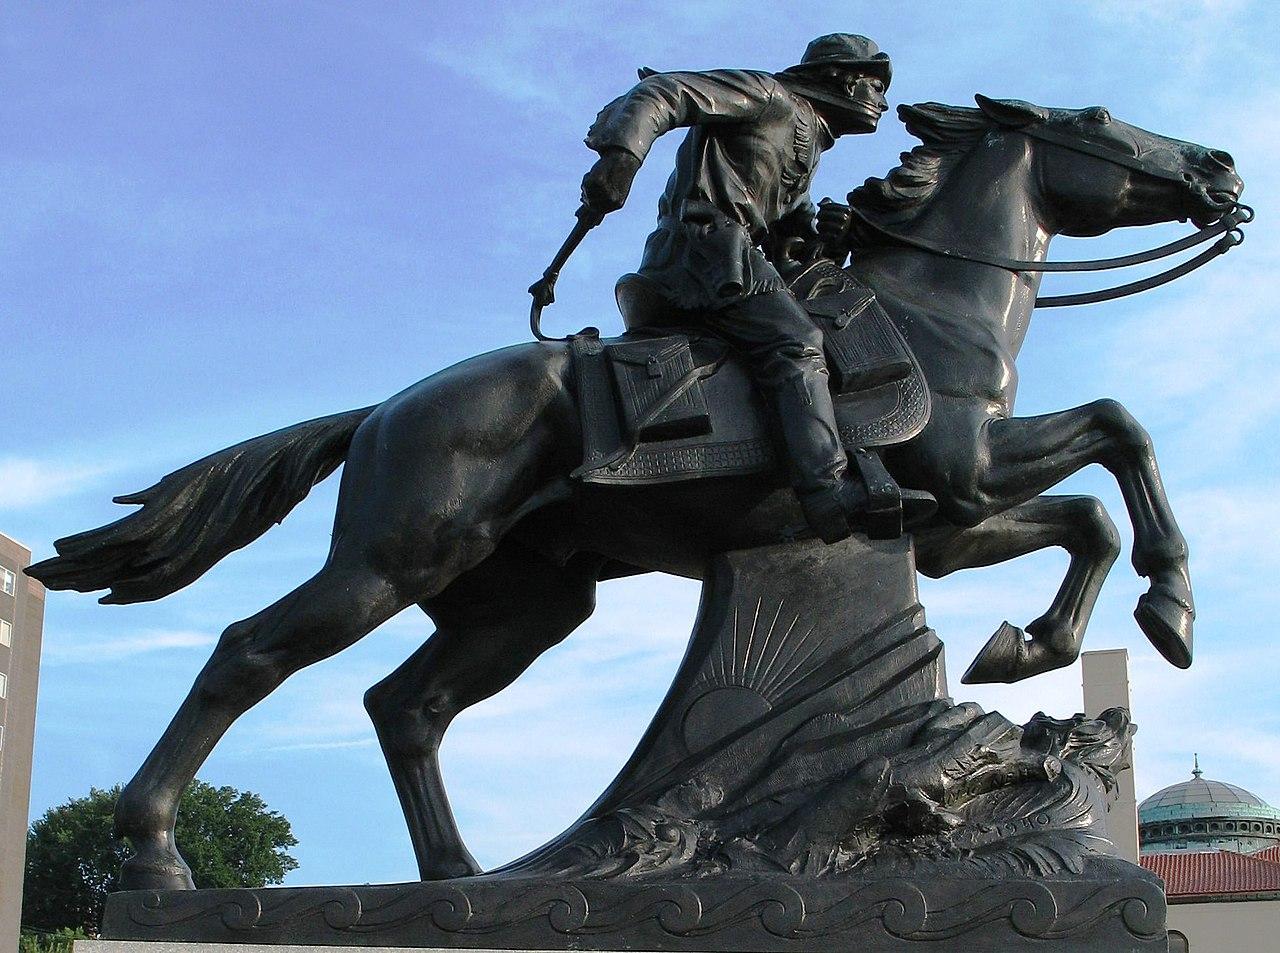 http://upload.wikimedia.org/wikipedia/commons/thumb/f/f5/Pony-express-statue.jpg/1280px-Pony-express-statue.jpg